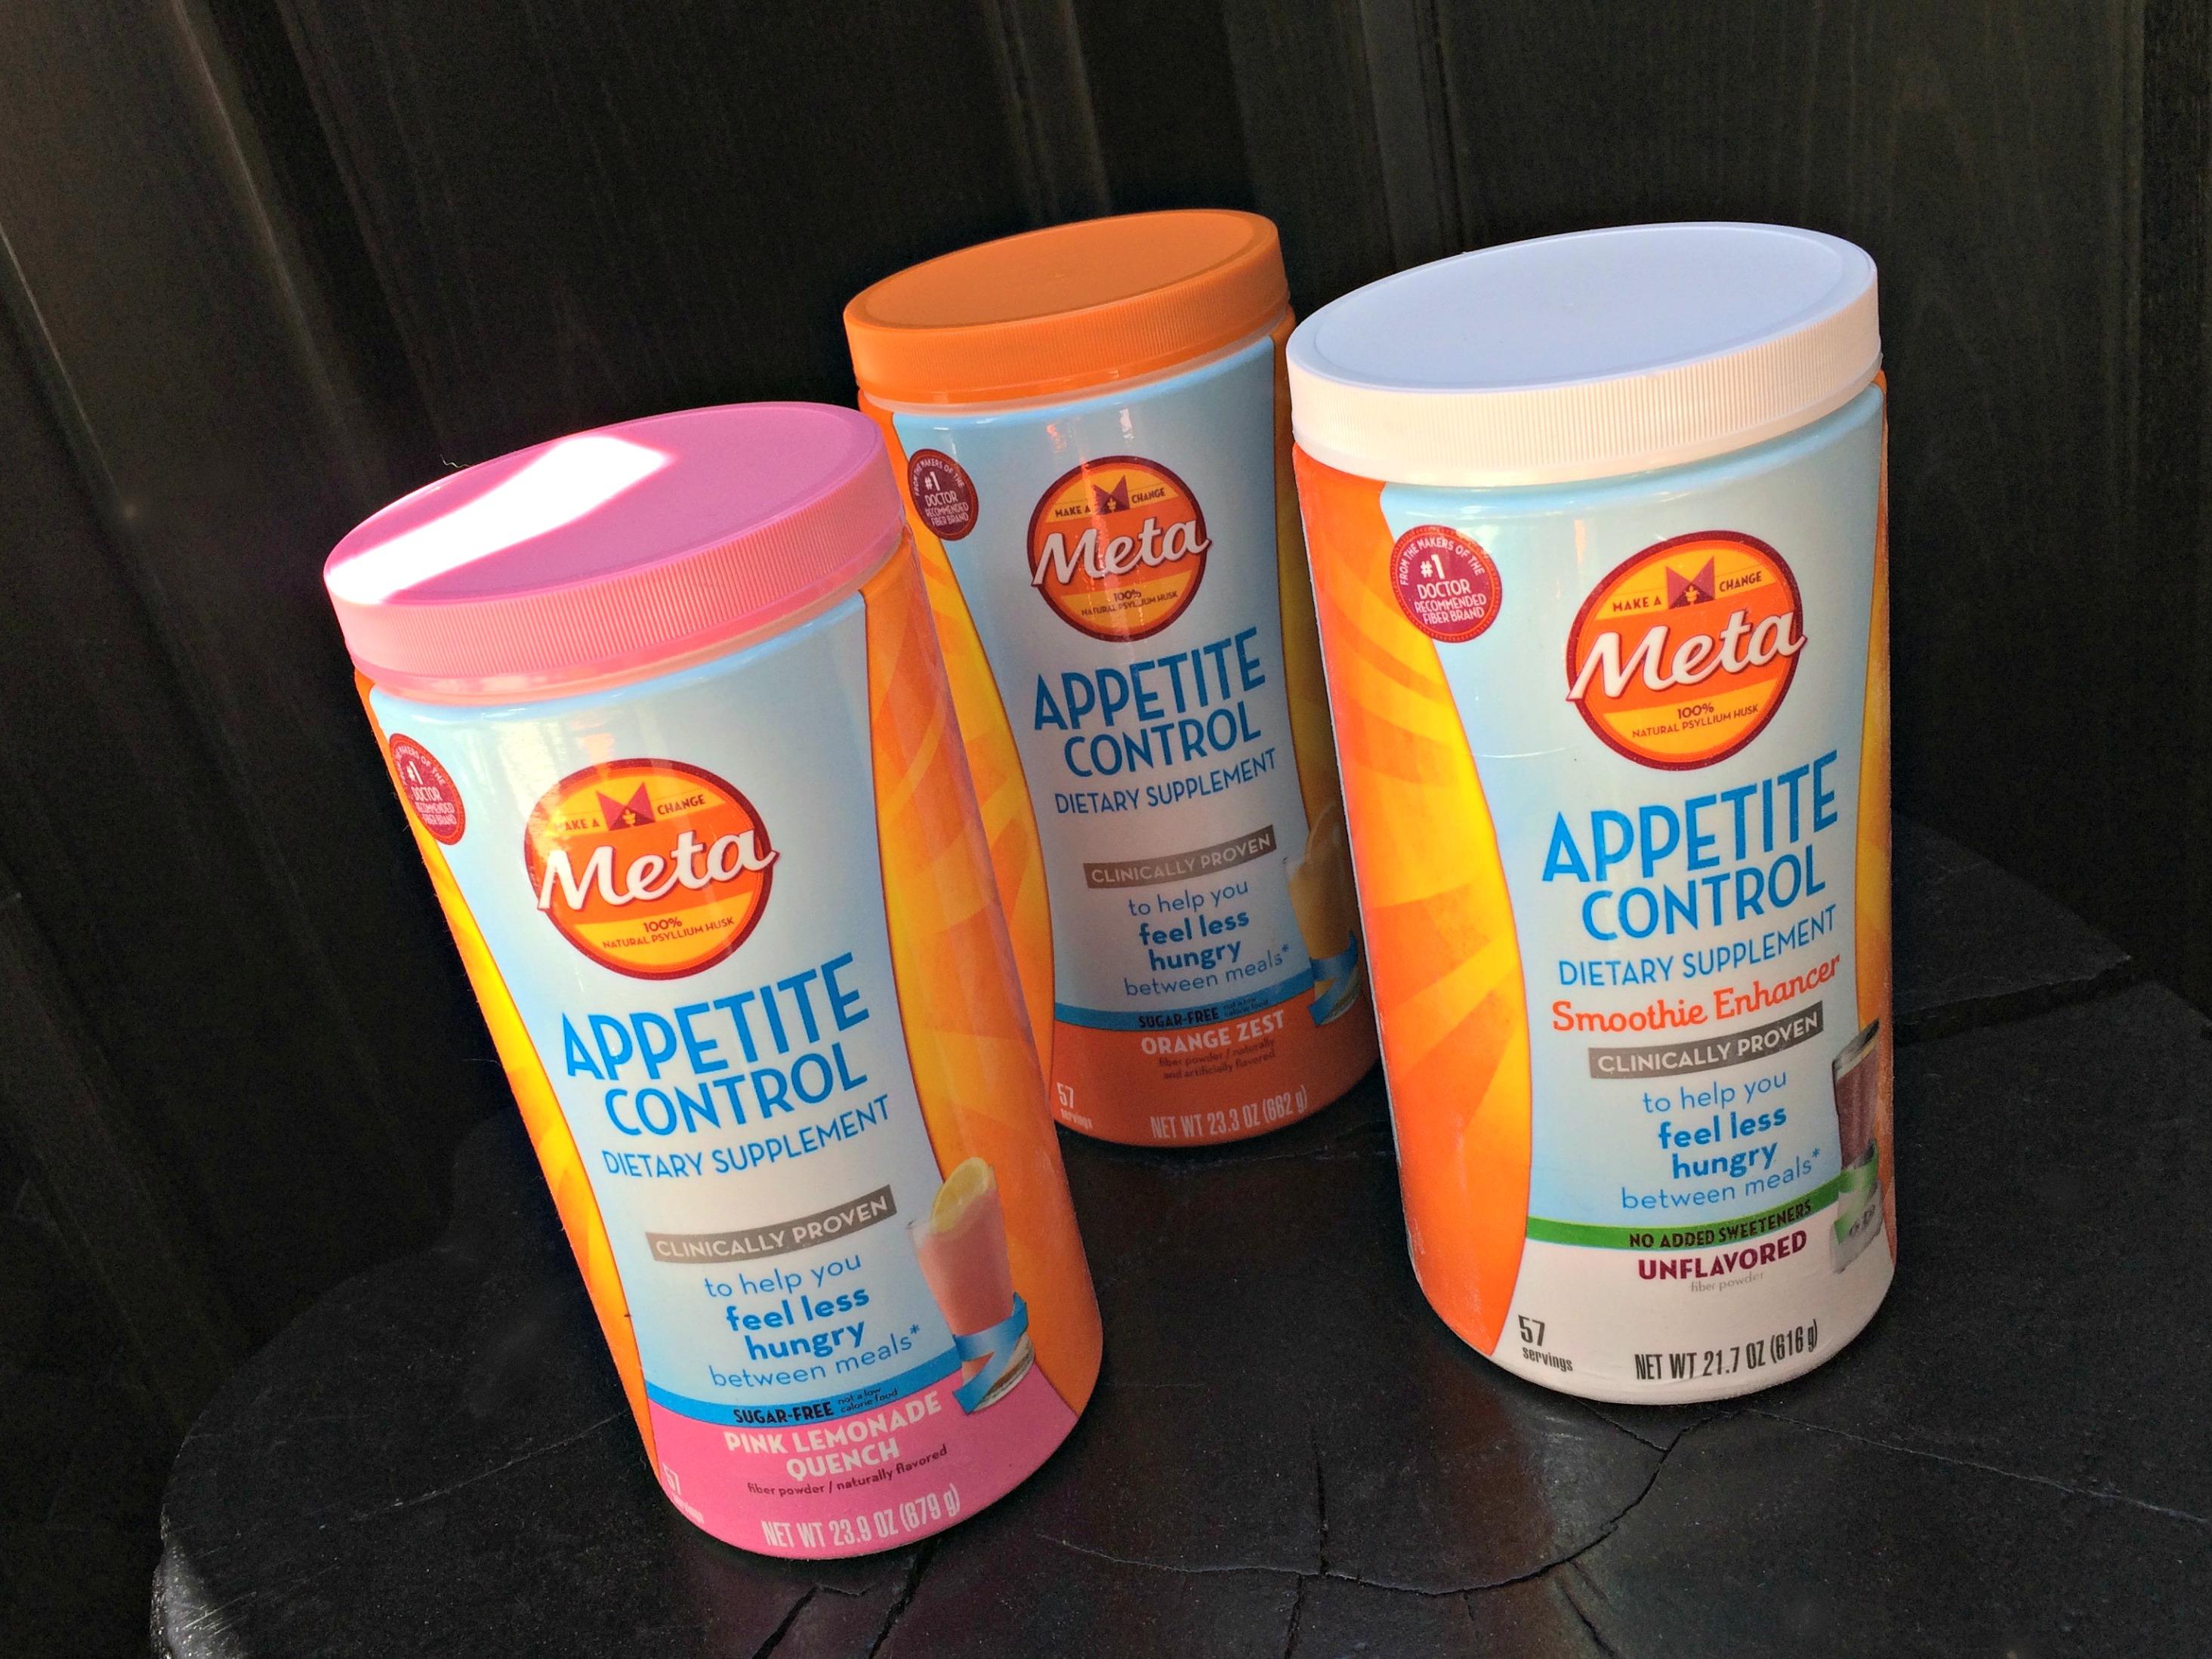 Meta appetite control dietary supplement